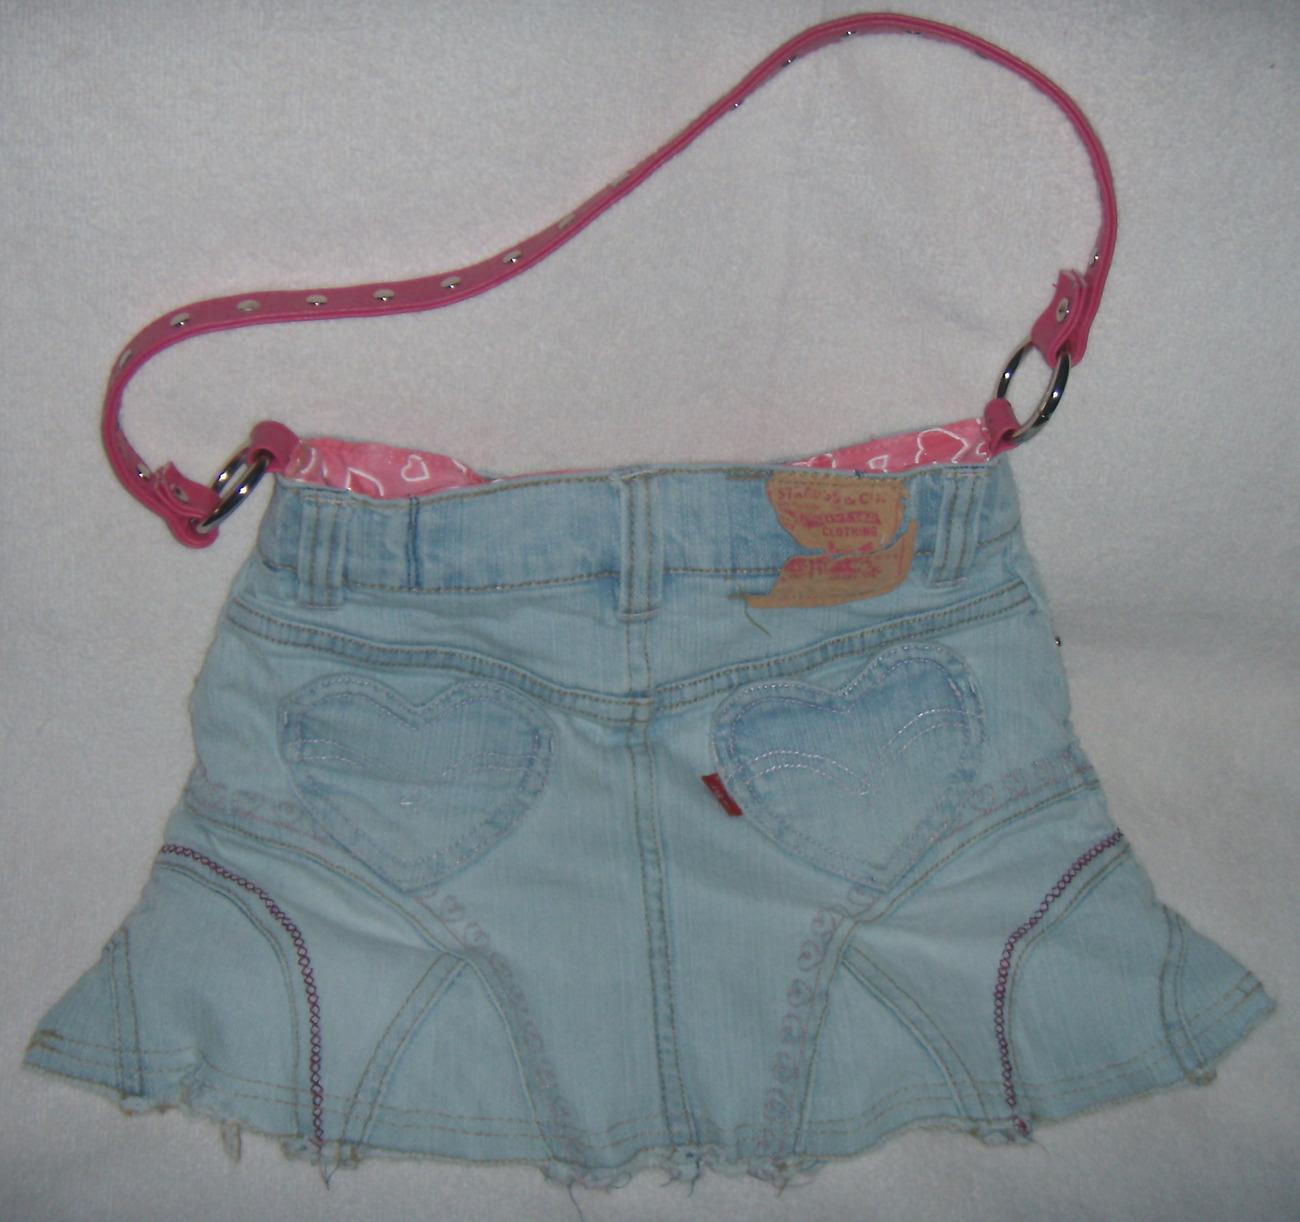 Girls Recycled Levi Skirt Purse